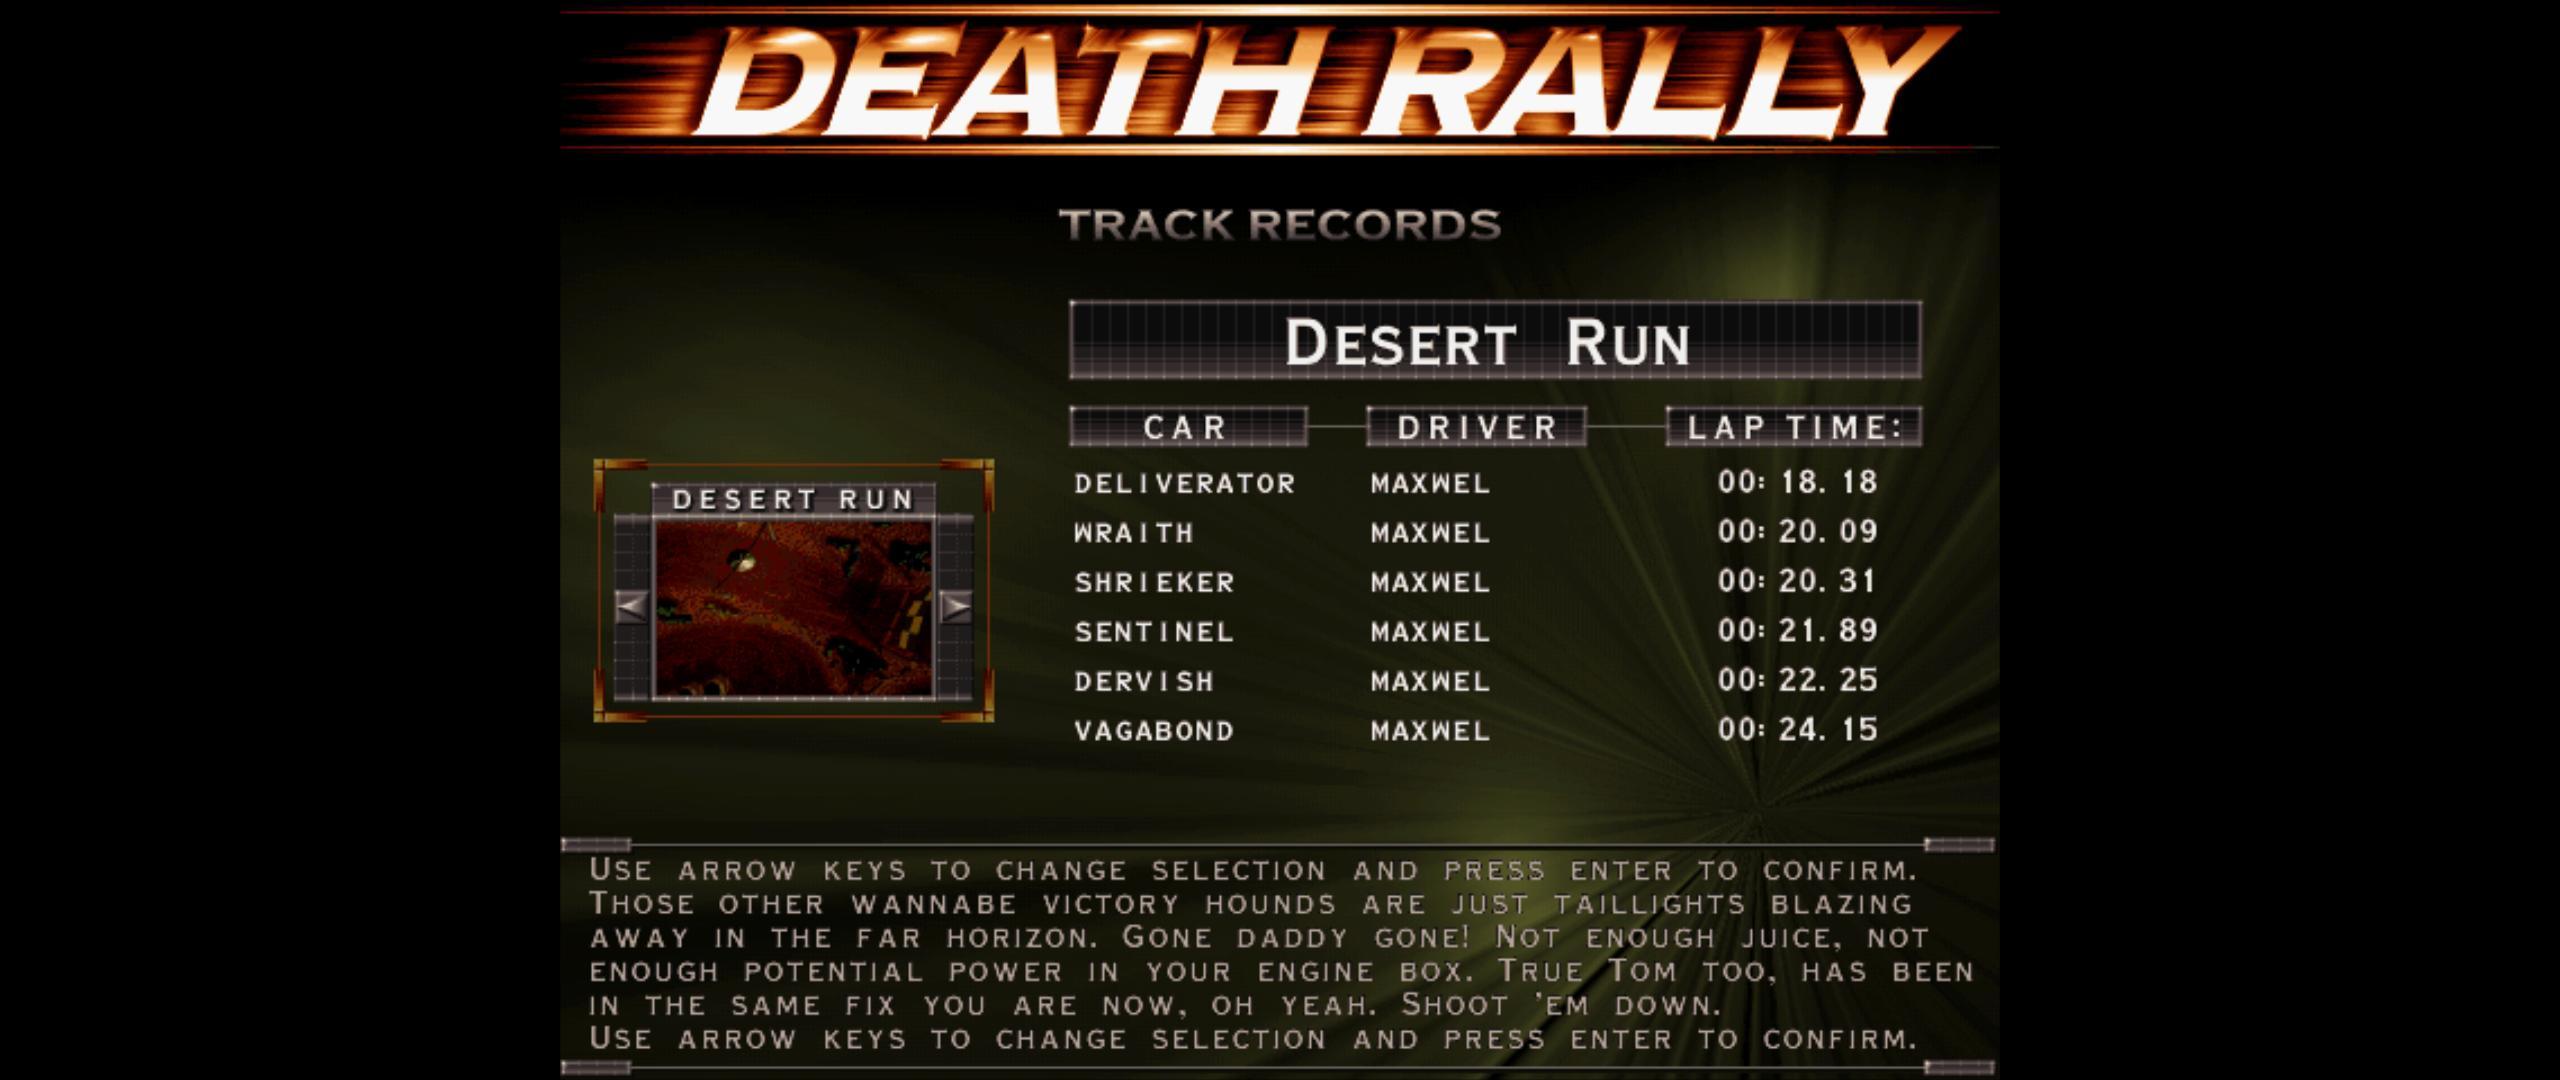 Maxwel: Death Rally [Desert Run, Shrieker Car] (PC) 0:00:20.31 points on 2016-03-04 06:58:32